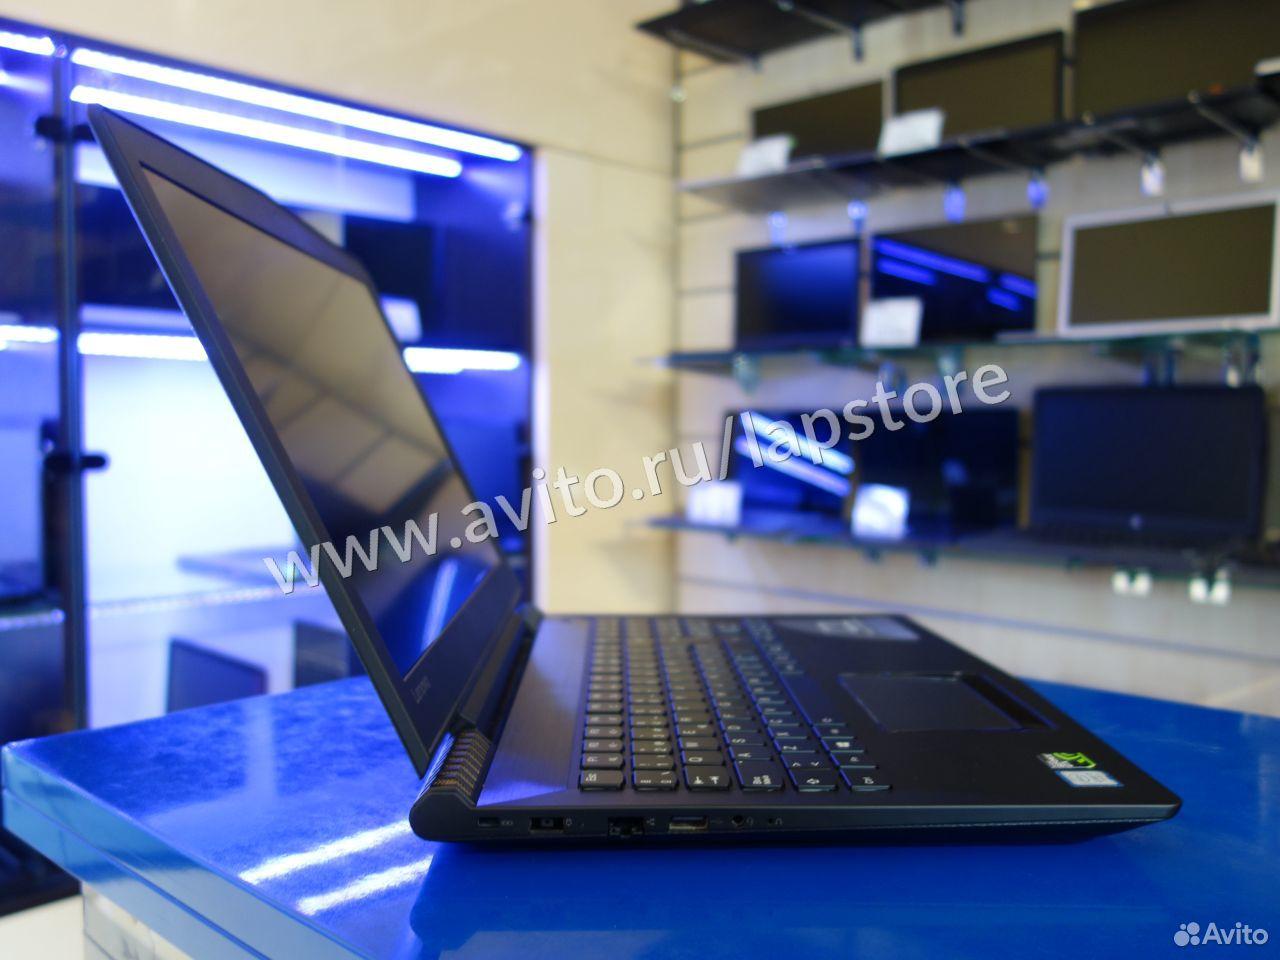 Ноутбук Lenovo Y520 i7-7700HQ/16GB/256+1T/GTX1050  84012422018 купить 2